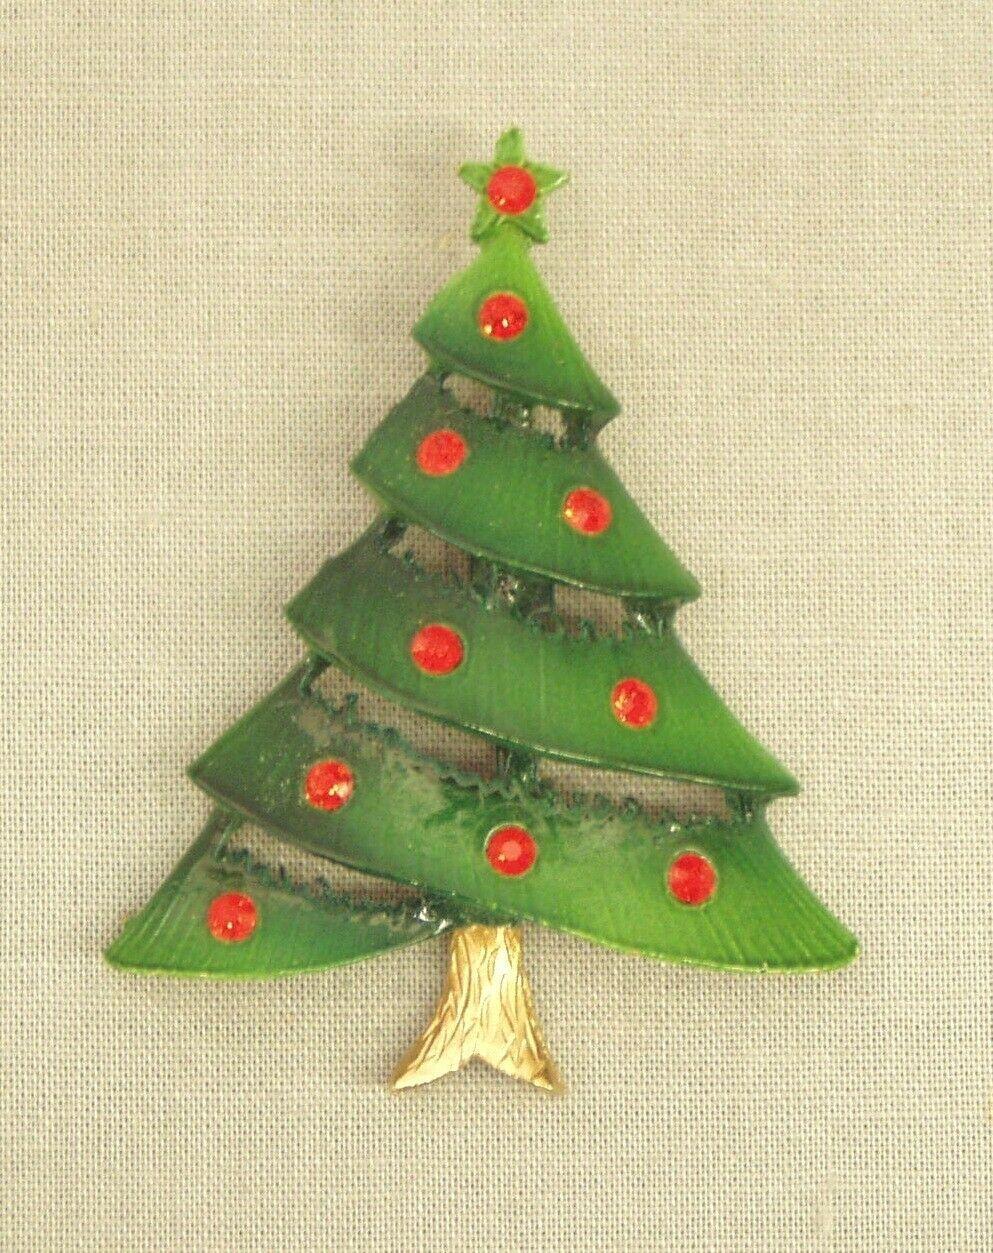 "Vintage Christmas Tree Pin Brooch green enamel red rhinestones jewelry 2.25"" t - $9.50"